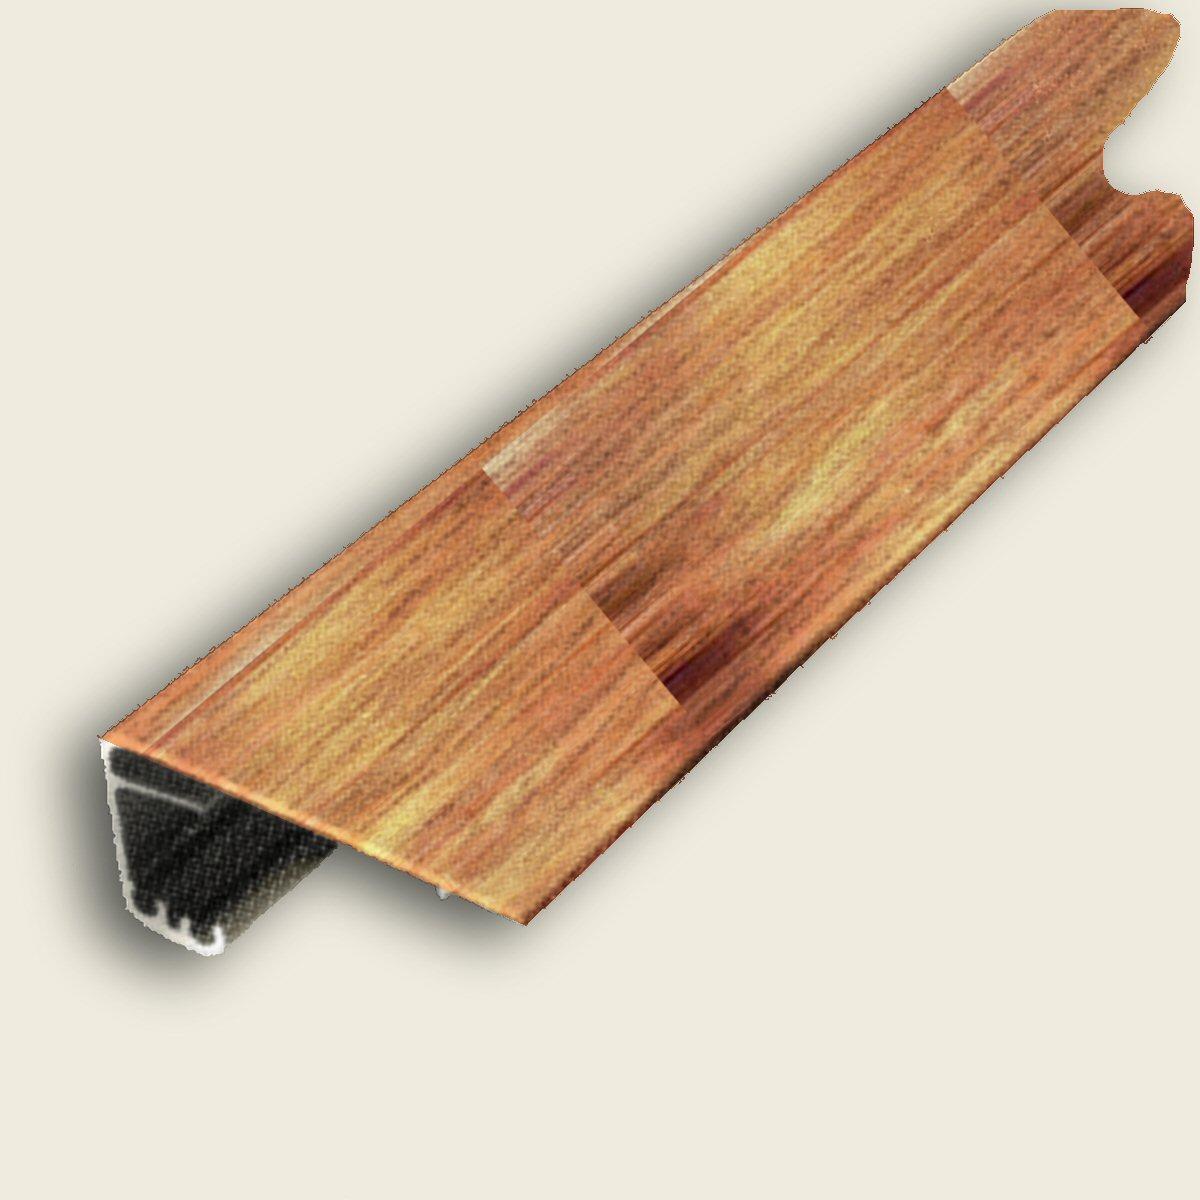 Top Class Carpentry